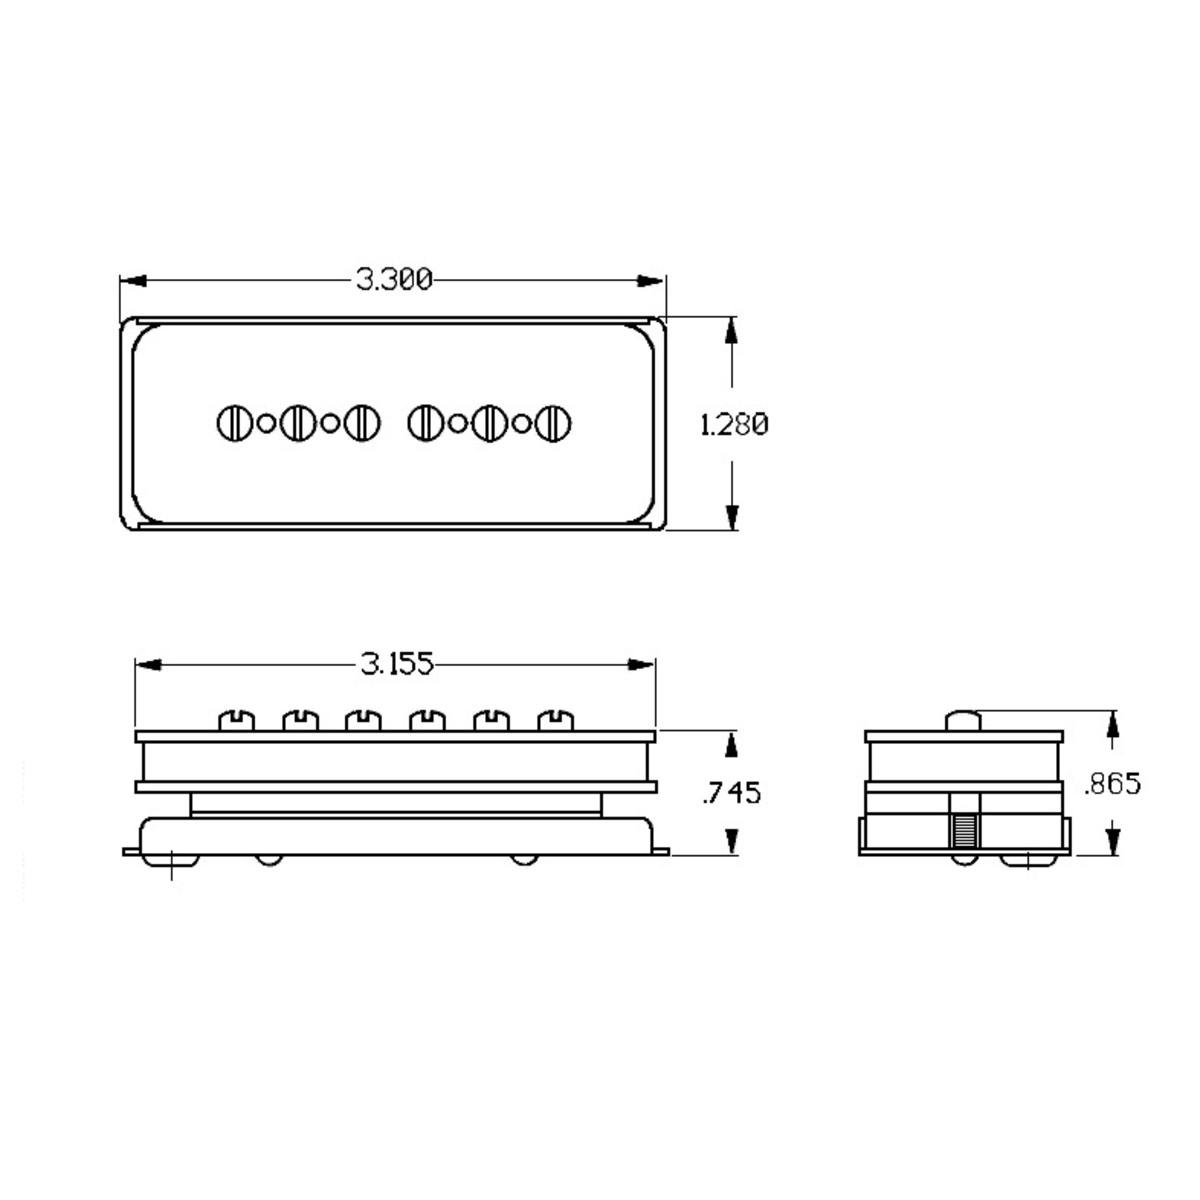 Seymour Duncan Antiquity P90 Dog Ear Pickup Bridge Black At Gear4music Vox Wiring Diagrams Loading Zoom